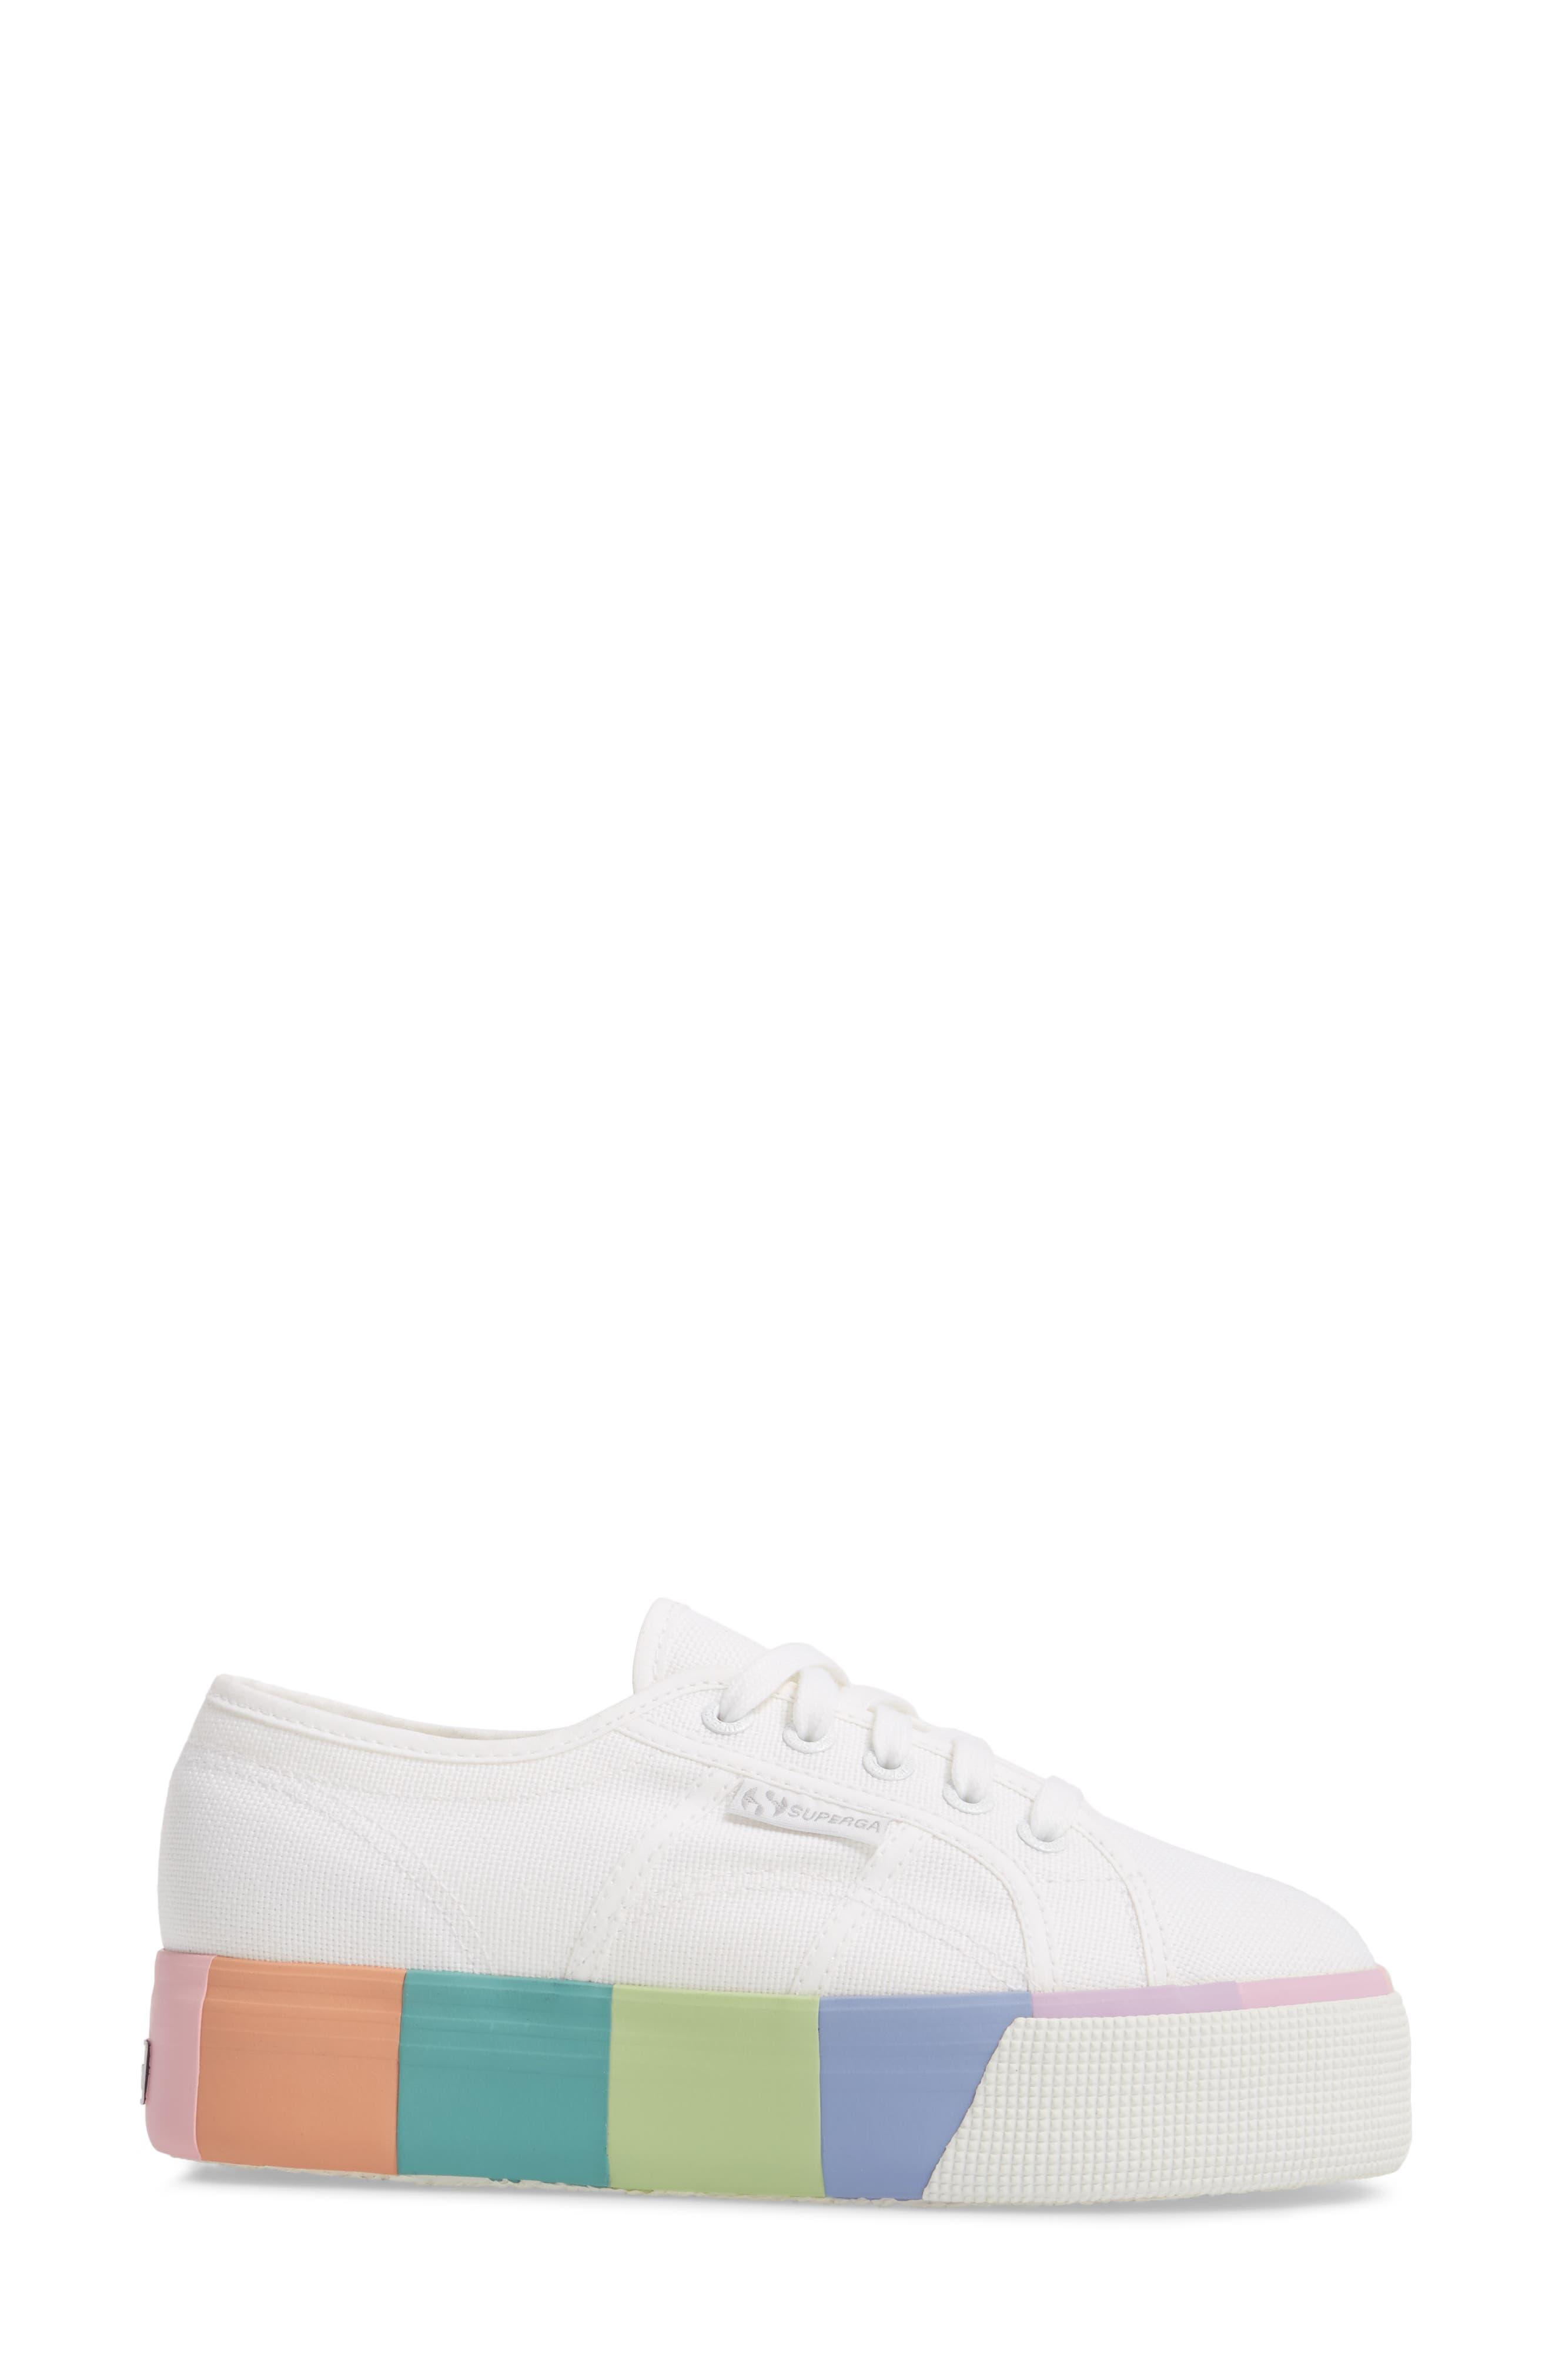 2790 Platform Sneaker,                             Alternate thumbnail 3, color,                             100